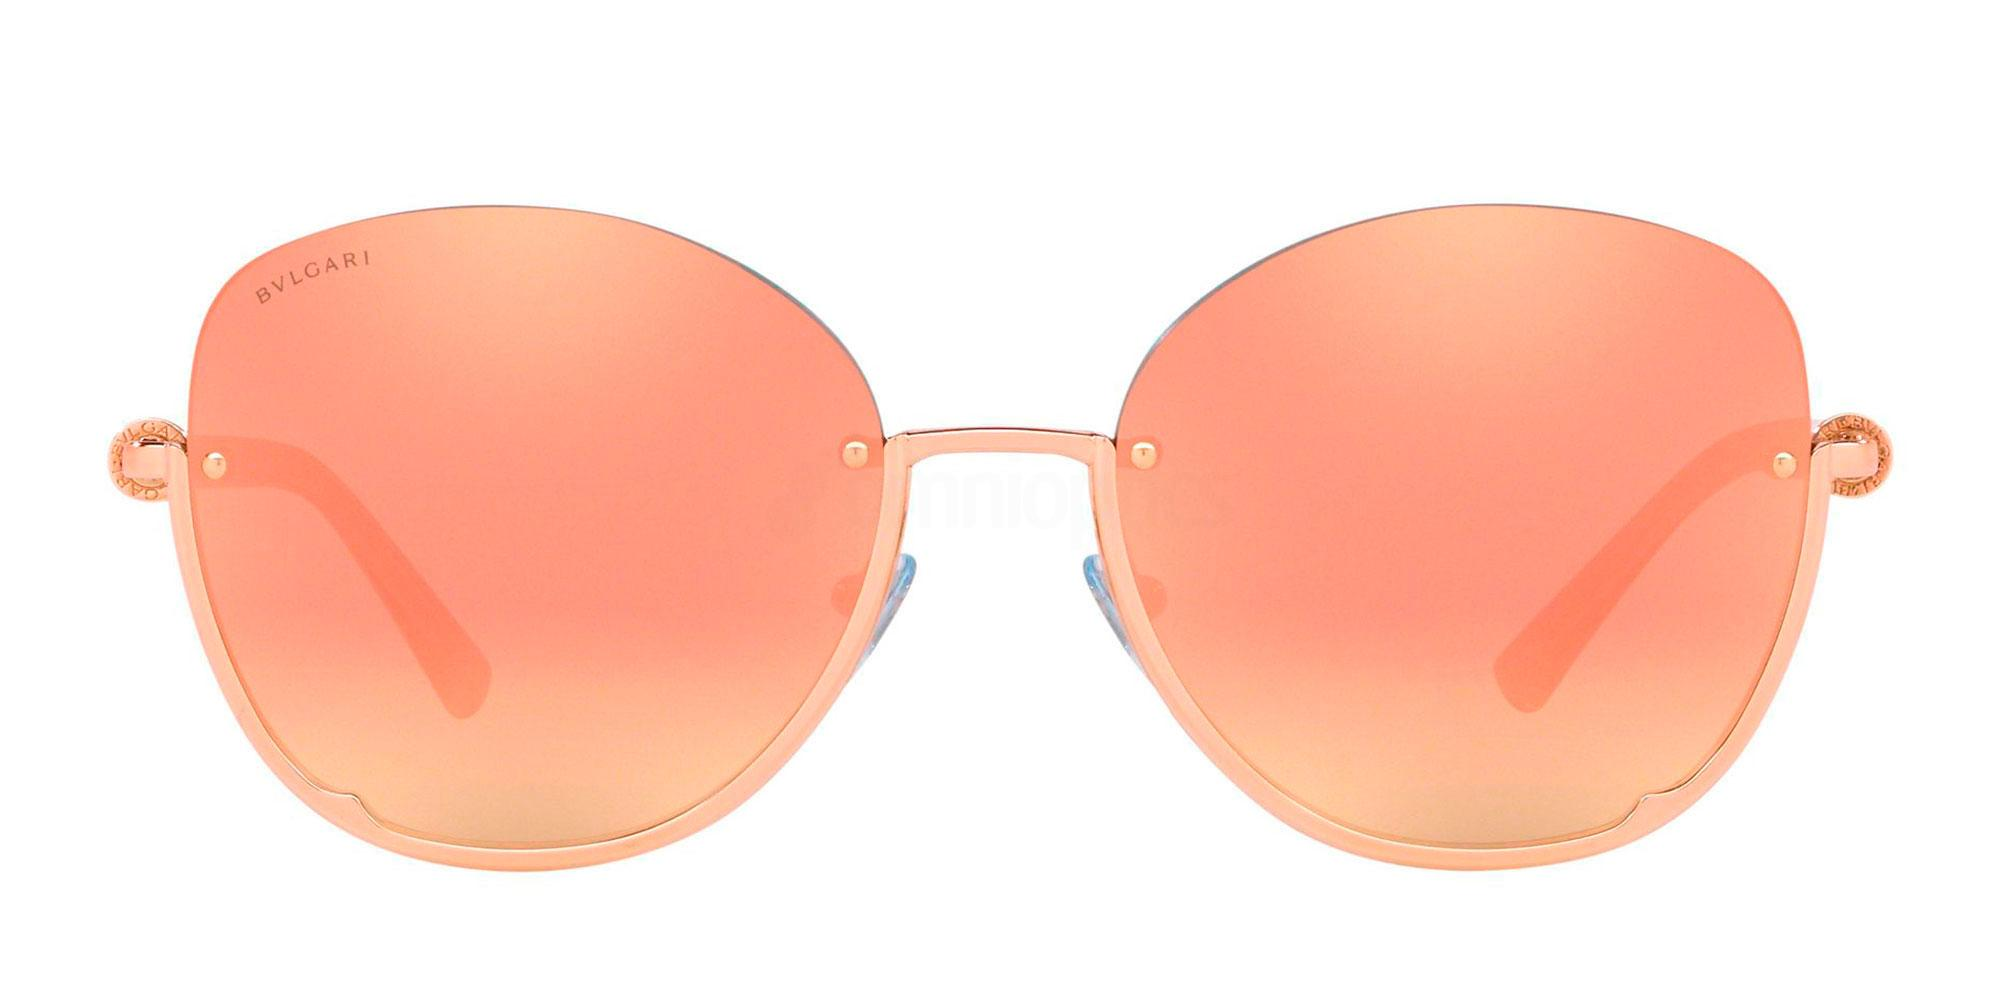 20144Z BV6123 Sunglasses, Bvlgari